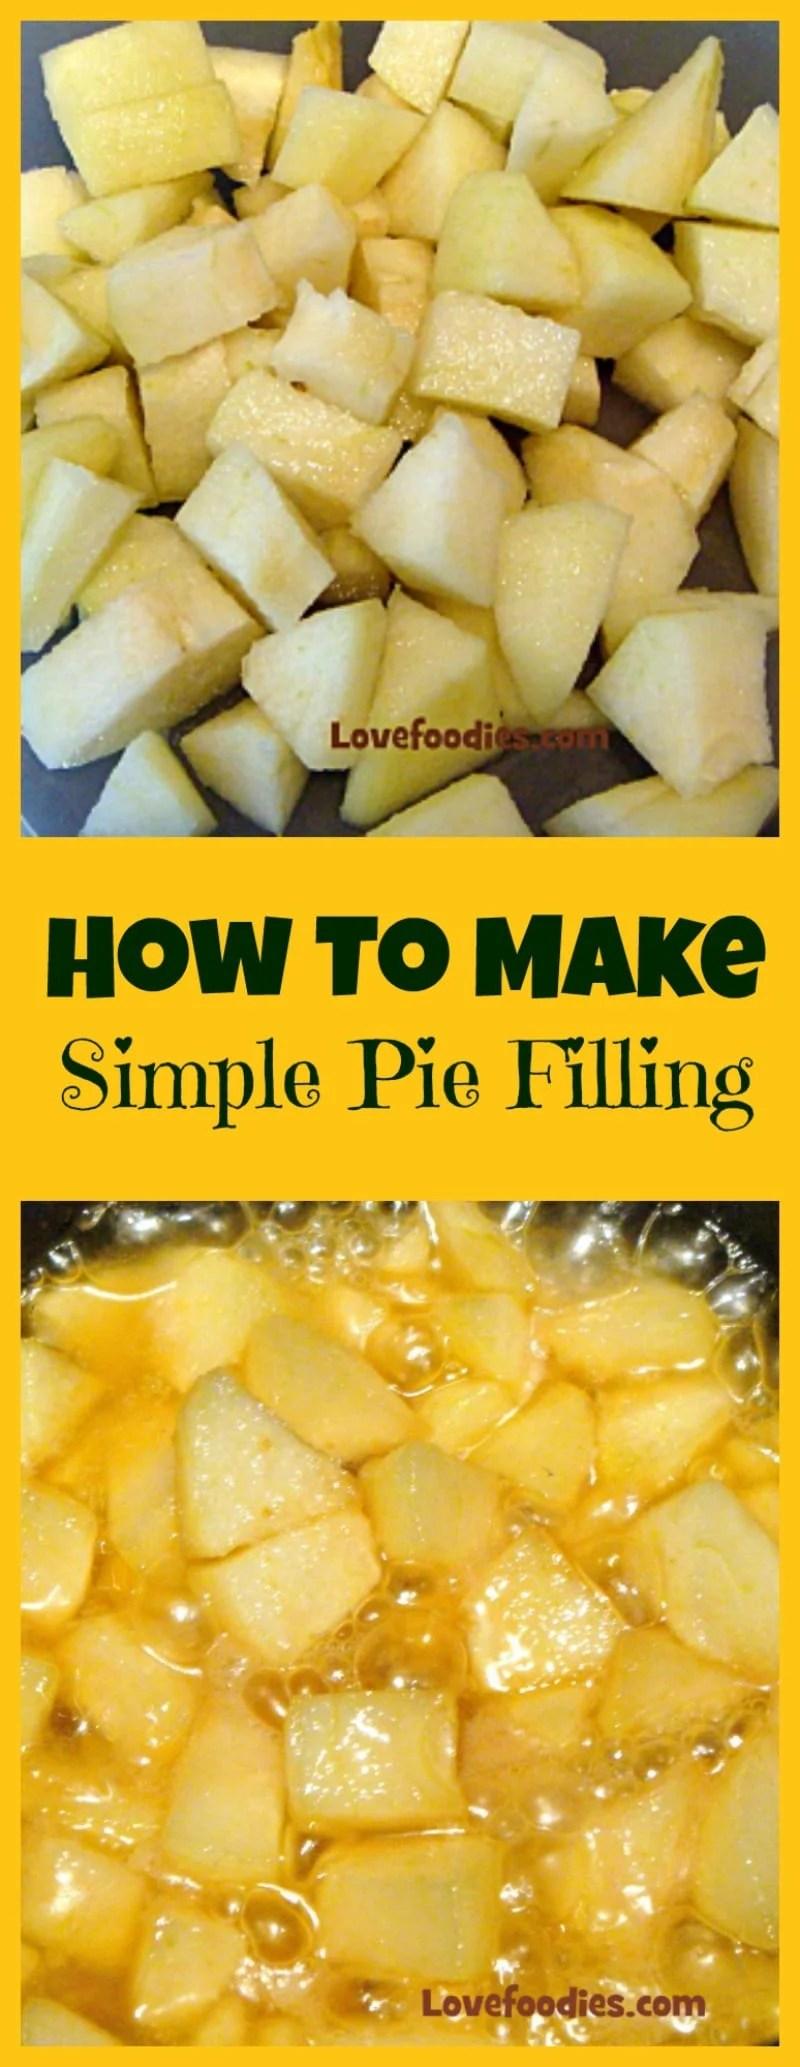 Apple Cobbler Using Pie Filling